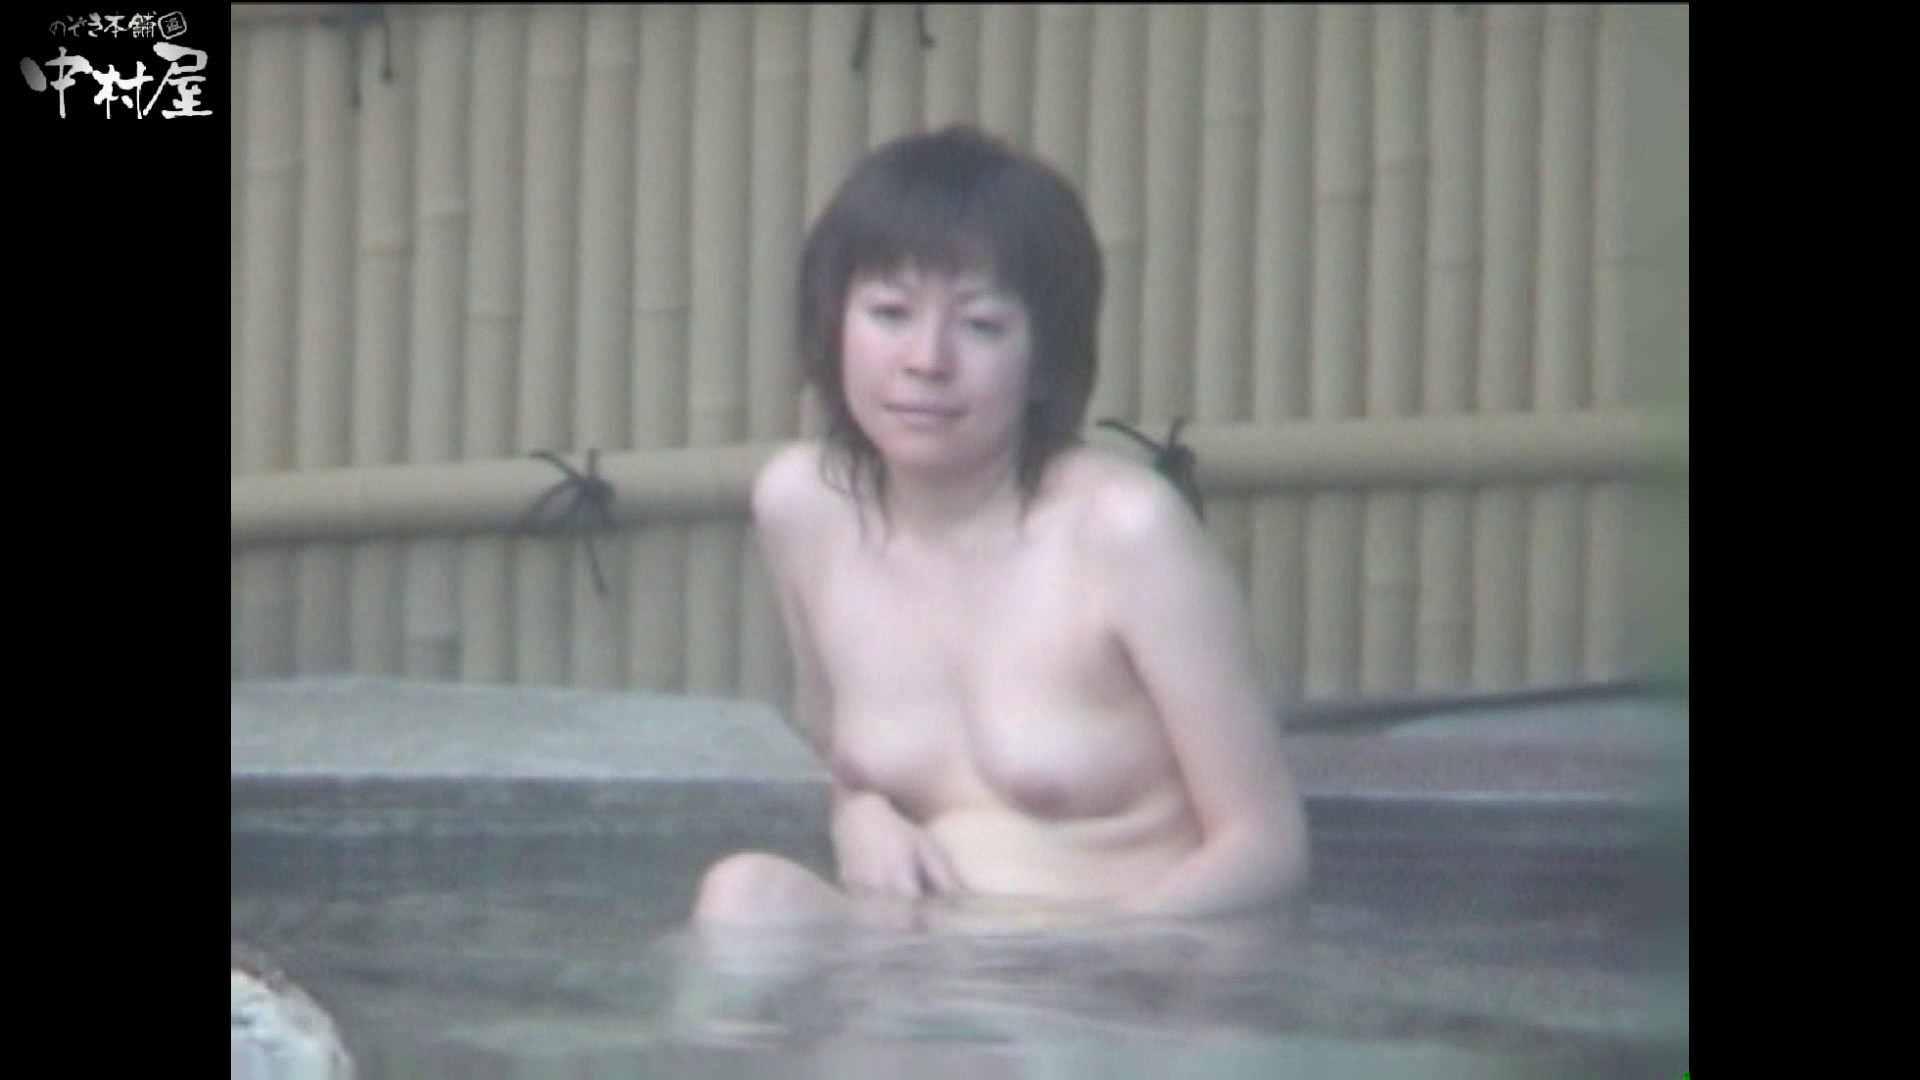 Aquaな露天風呂Vol.985 盗撮 おまんこ動画流出 50画像 8